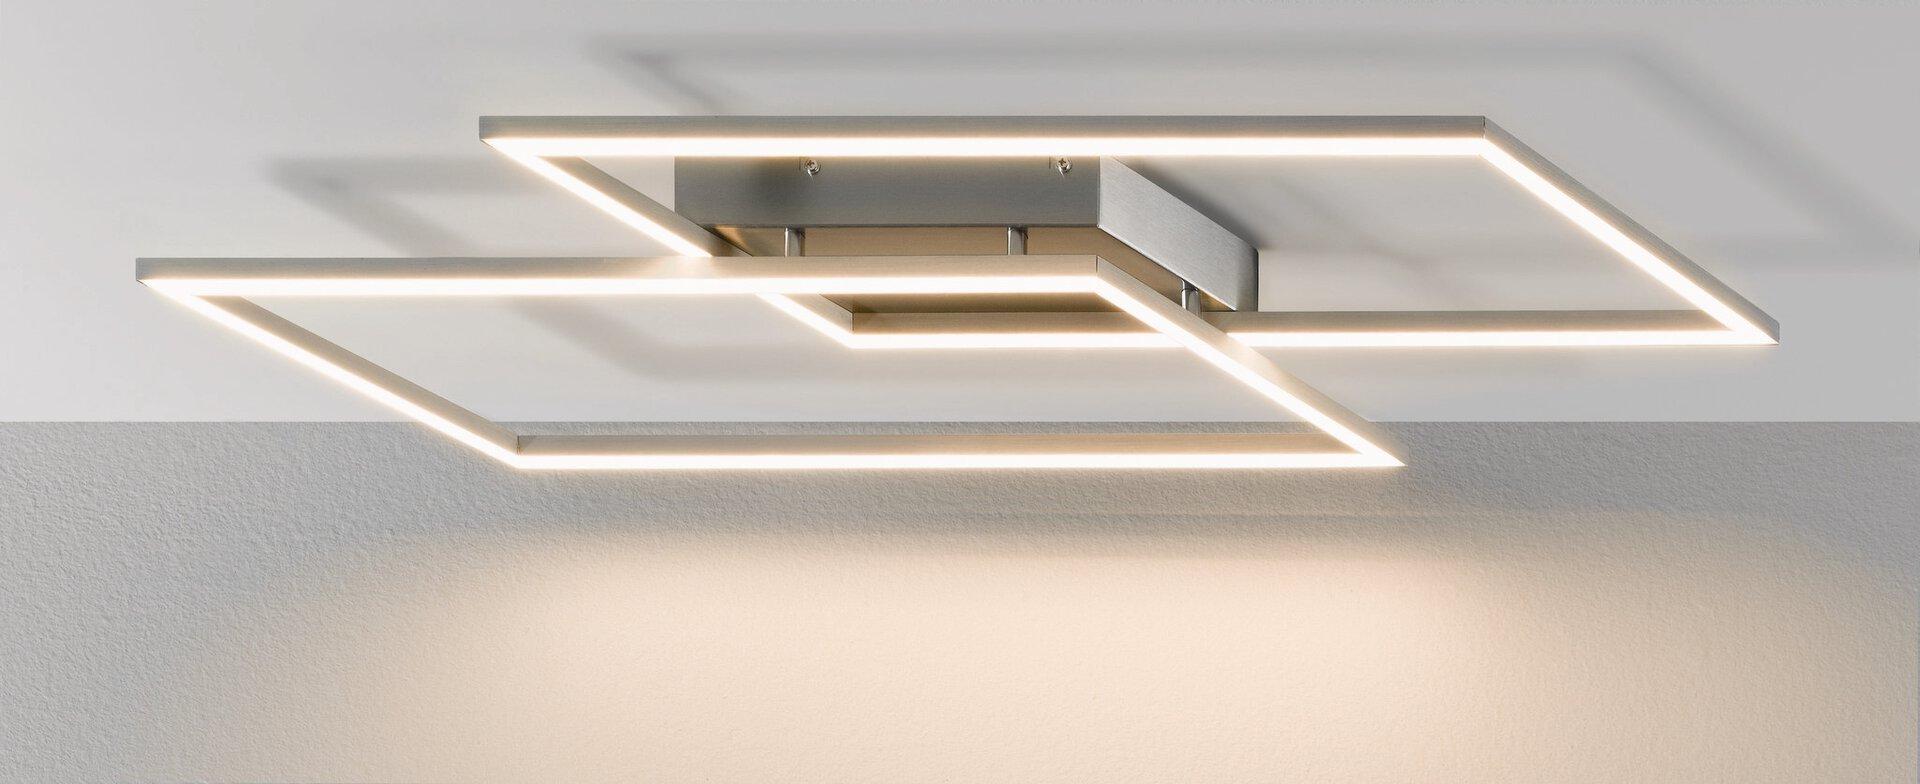 Deckenleuchte INIGO Paul Neuhaus Metall silber 24 x 7 x 54 cm